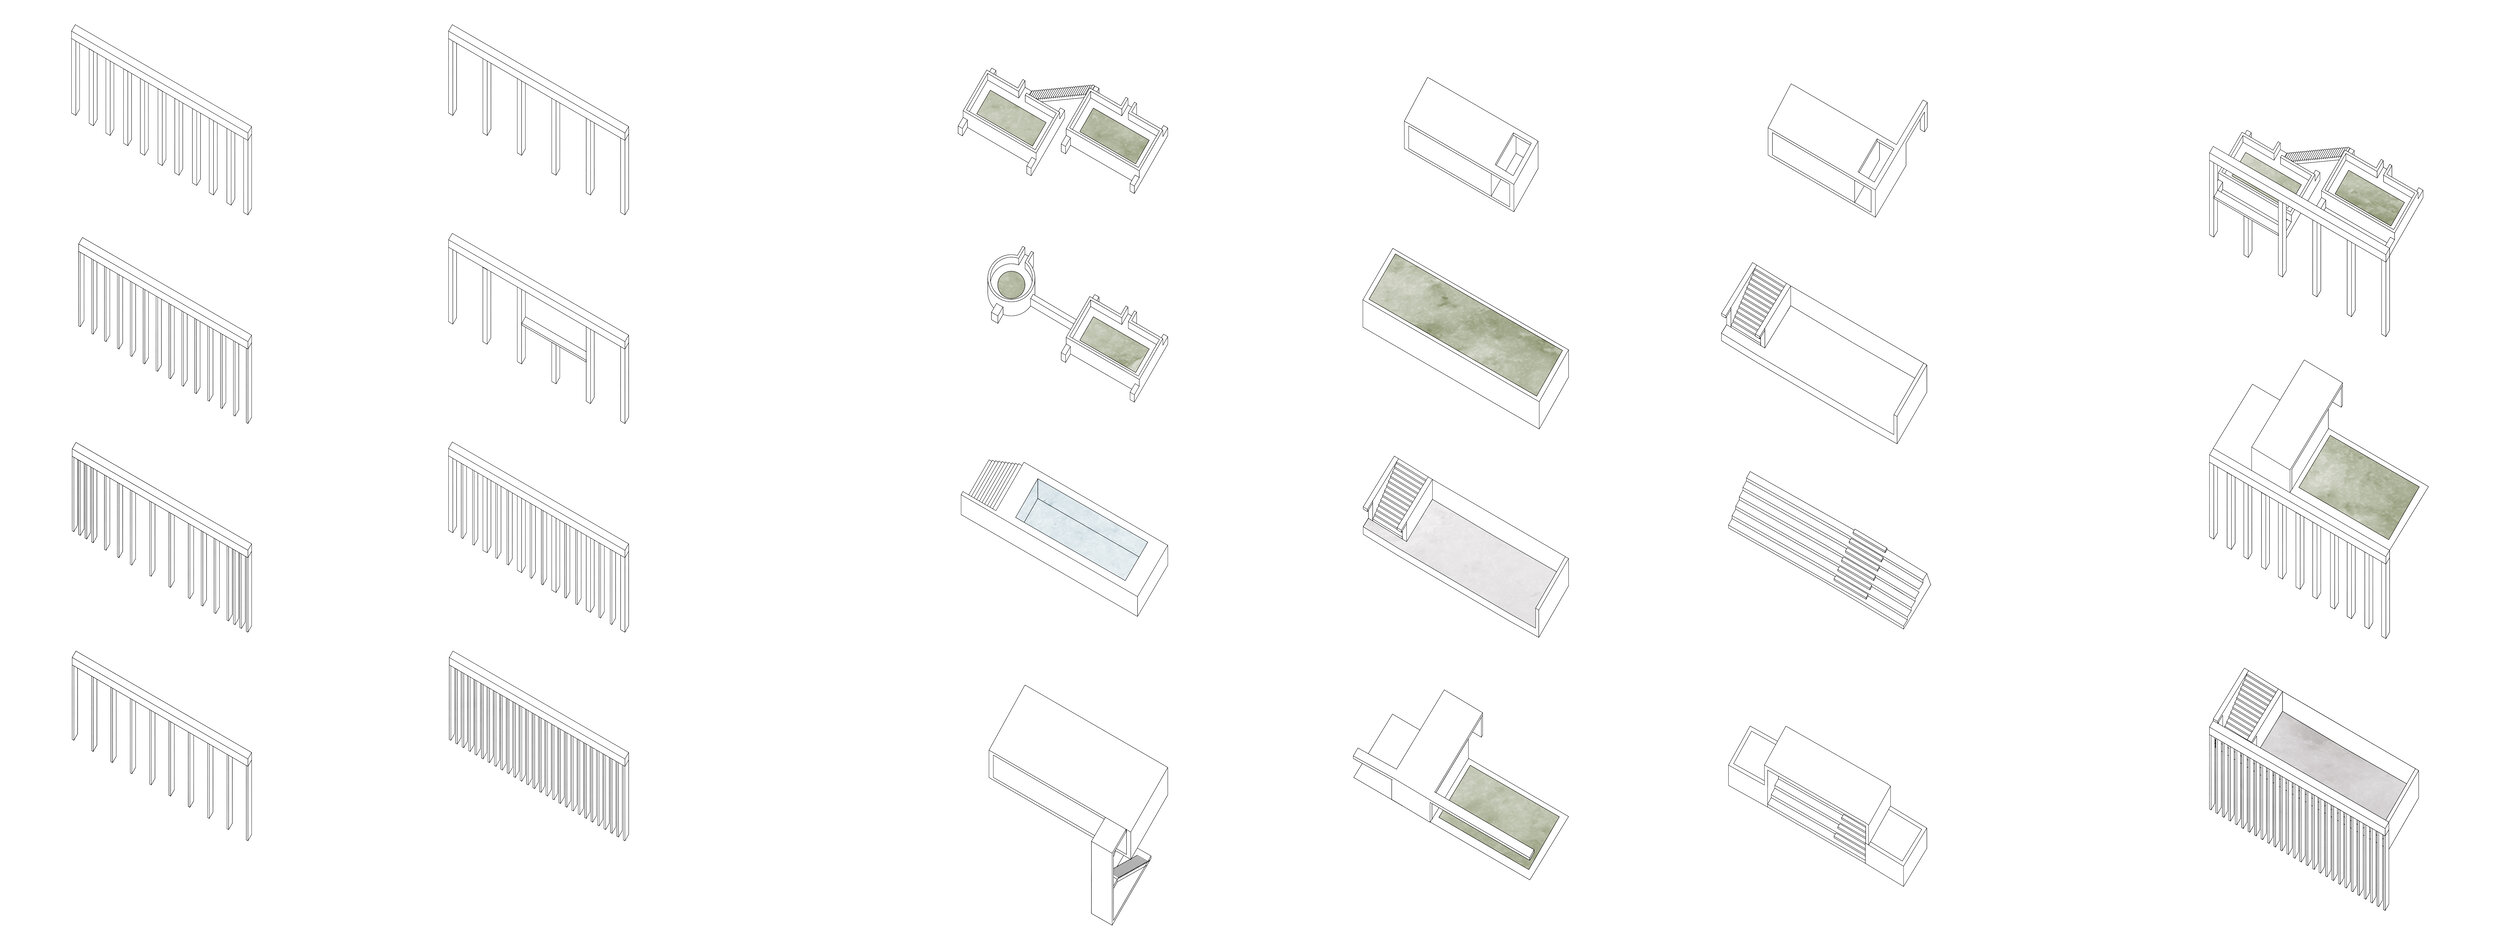 Kit of Parts.jpg